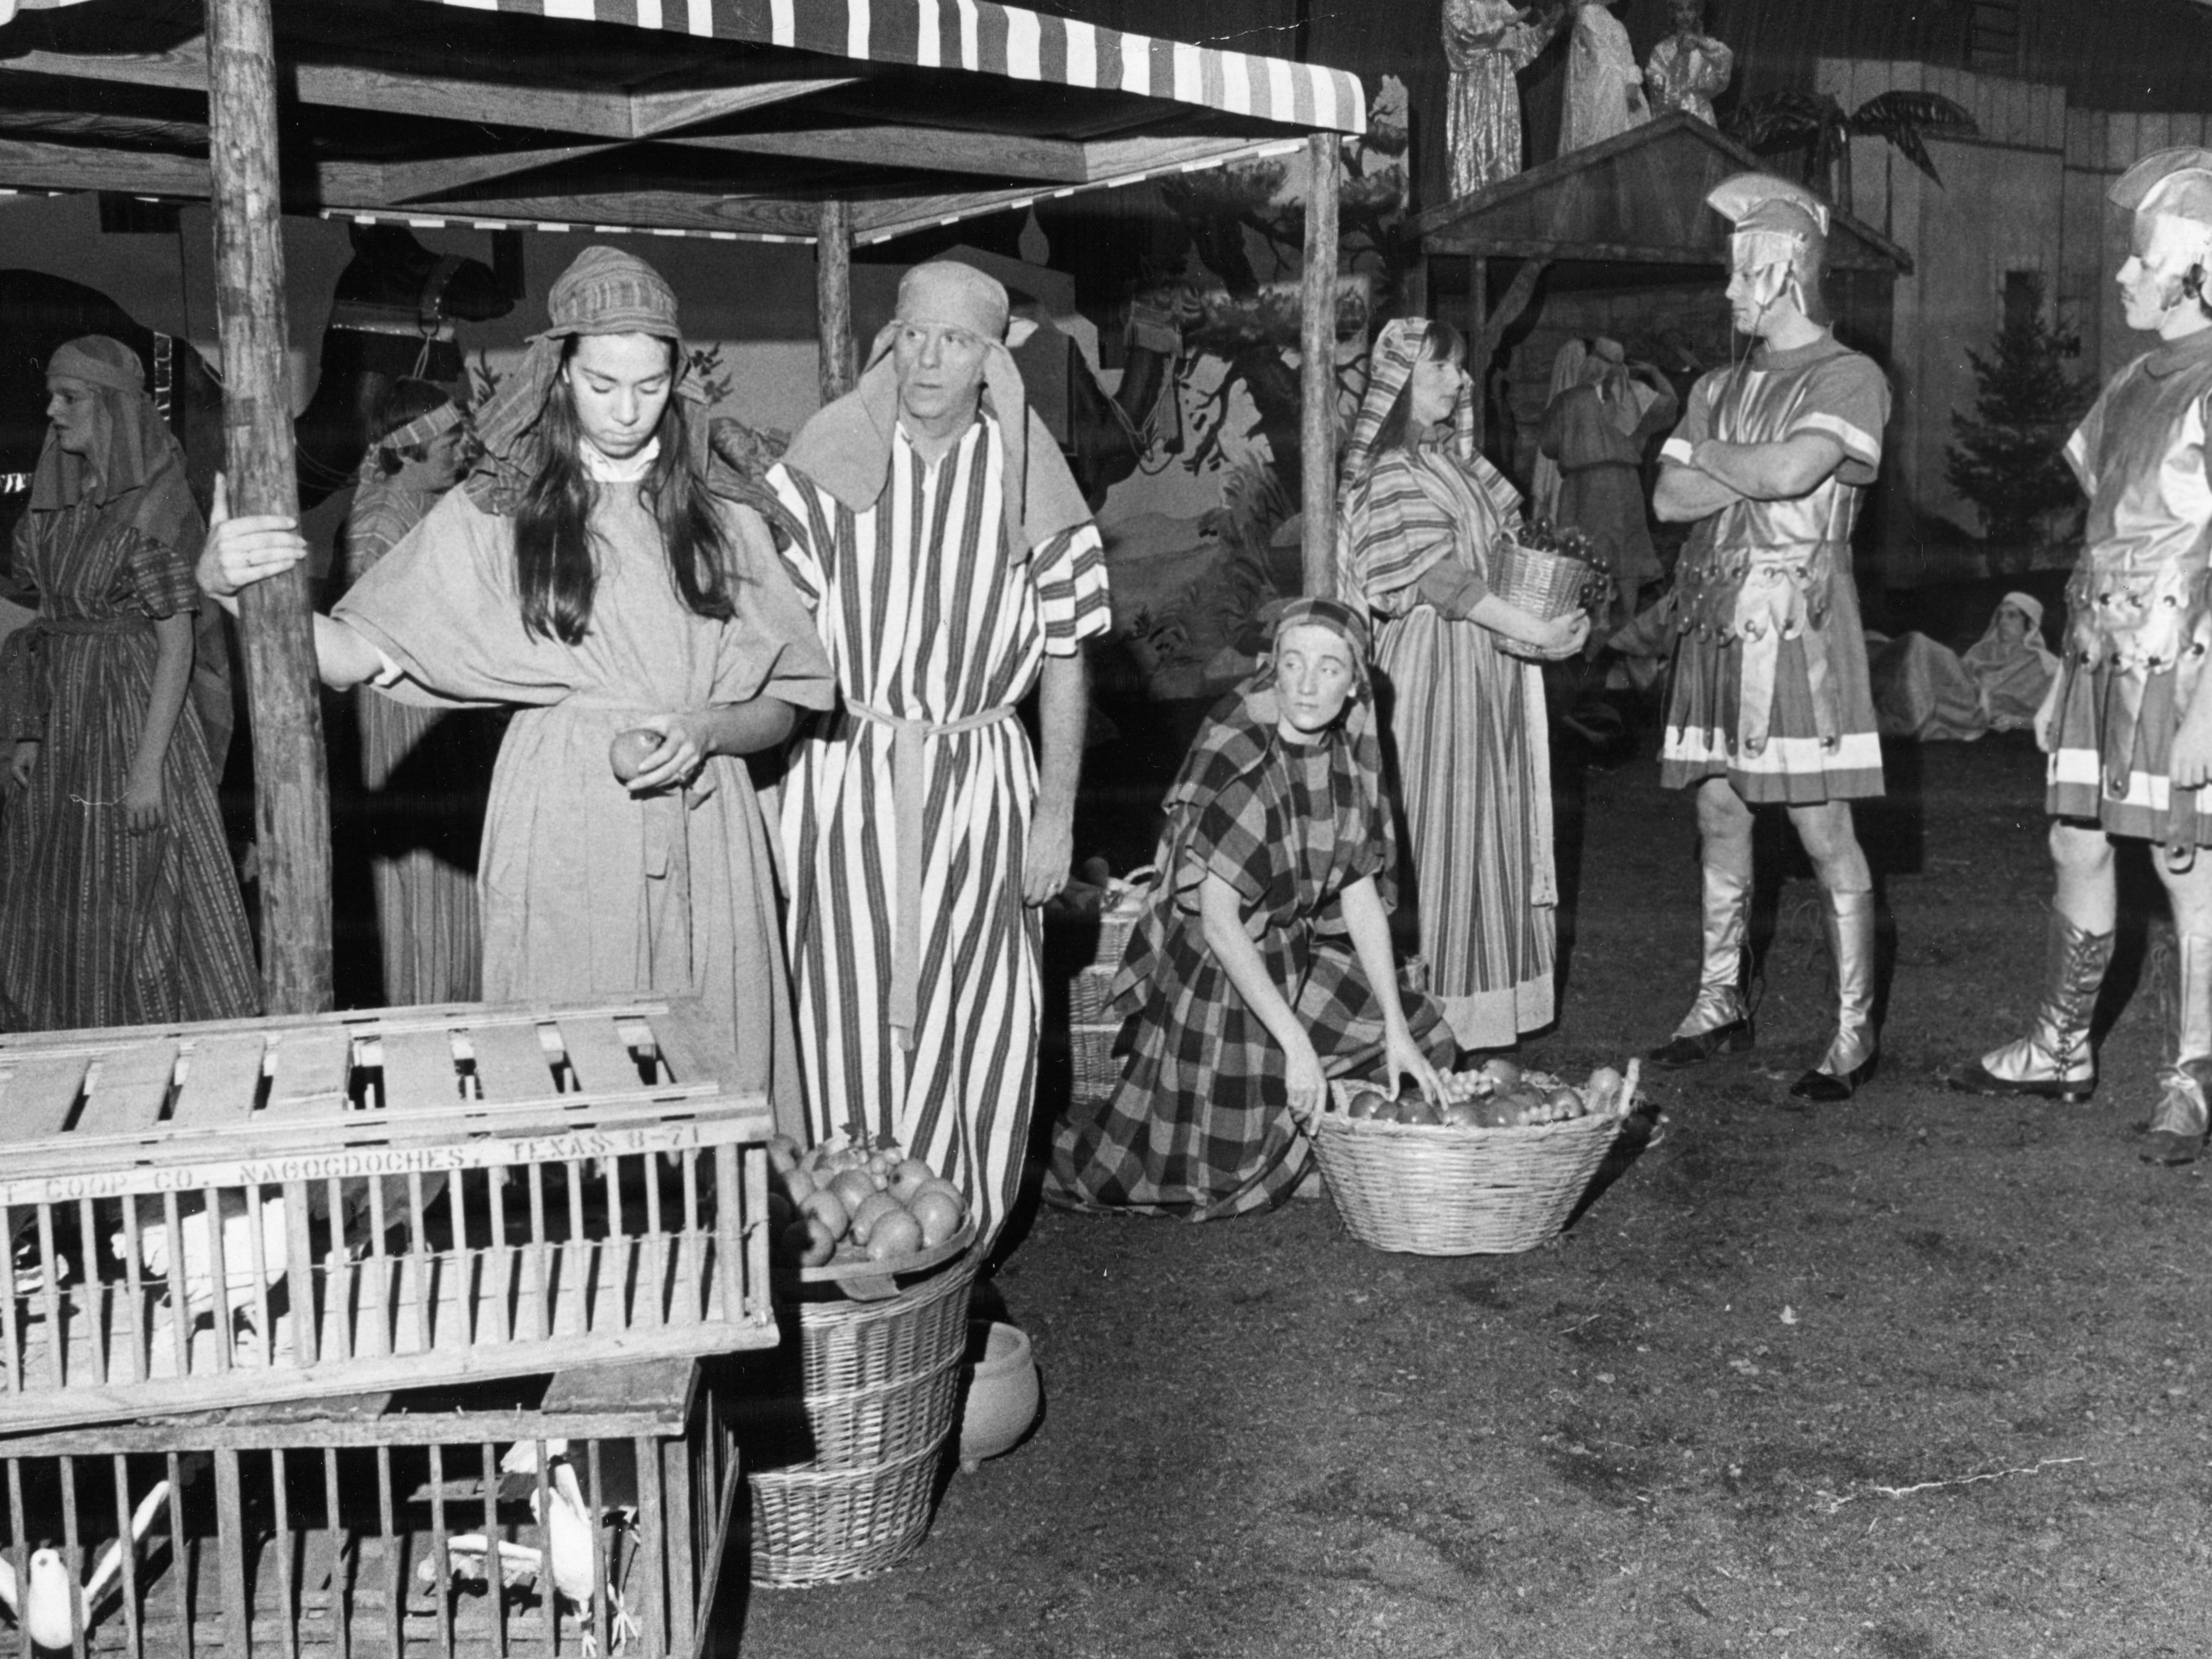 Rehearsing for the Nativity Pageant are Sharon Regas, Latain McGee, Jan Davis, Susan Stone, Jon Burnett, and Steve Reese on Dec. 14, 1969, at the Civic Coliseum.